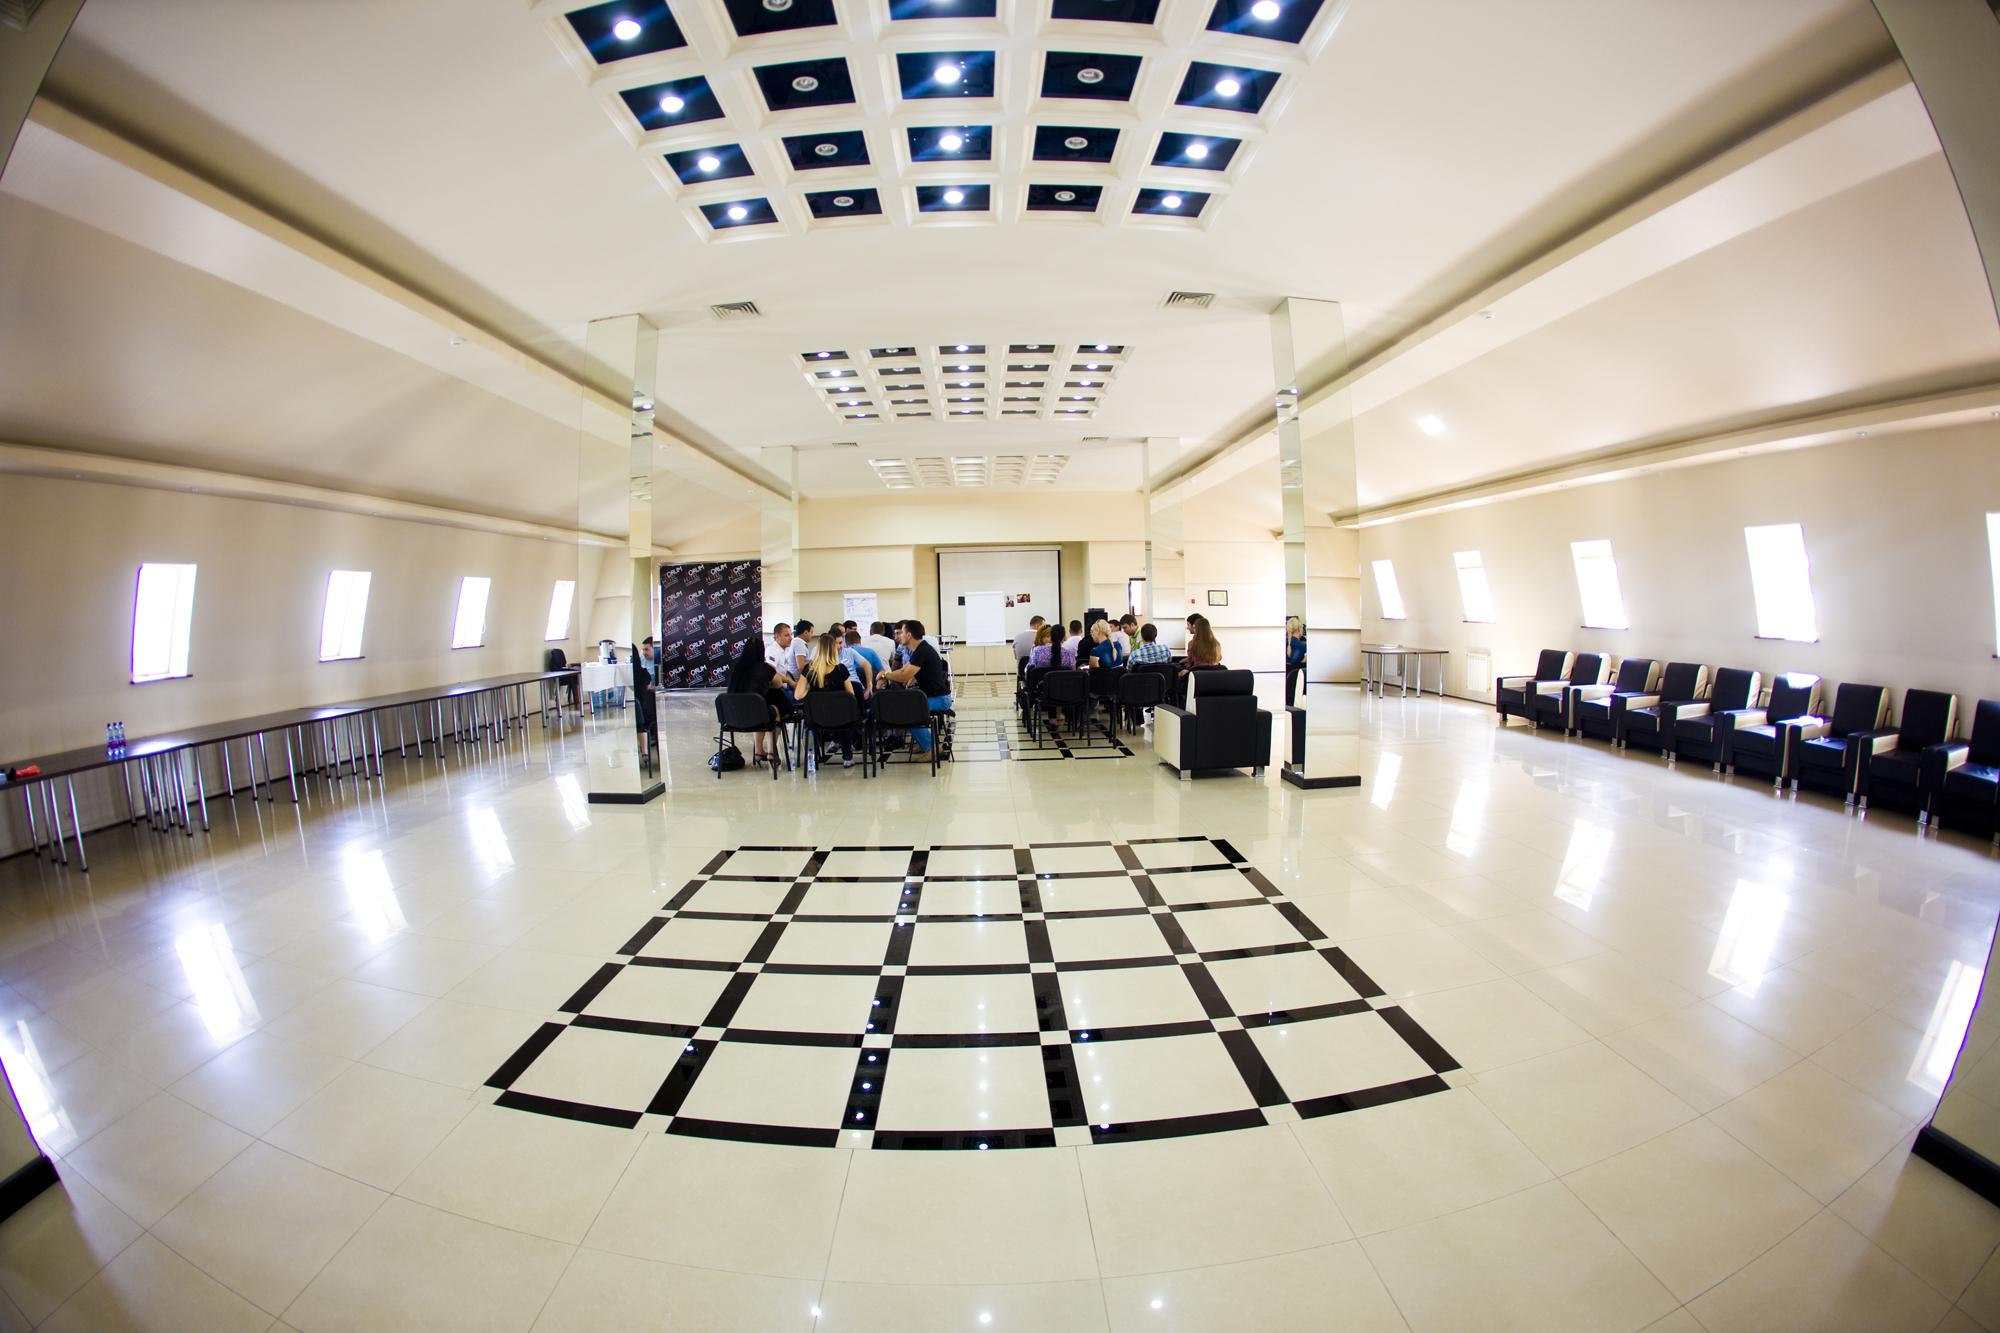 Гостиница с конференц залом краснодар